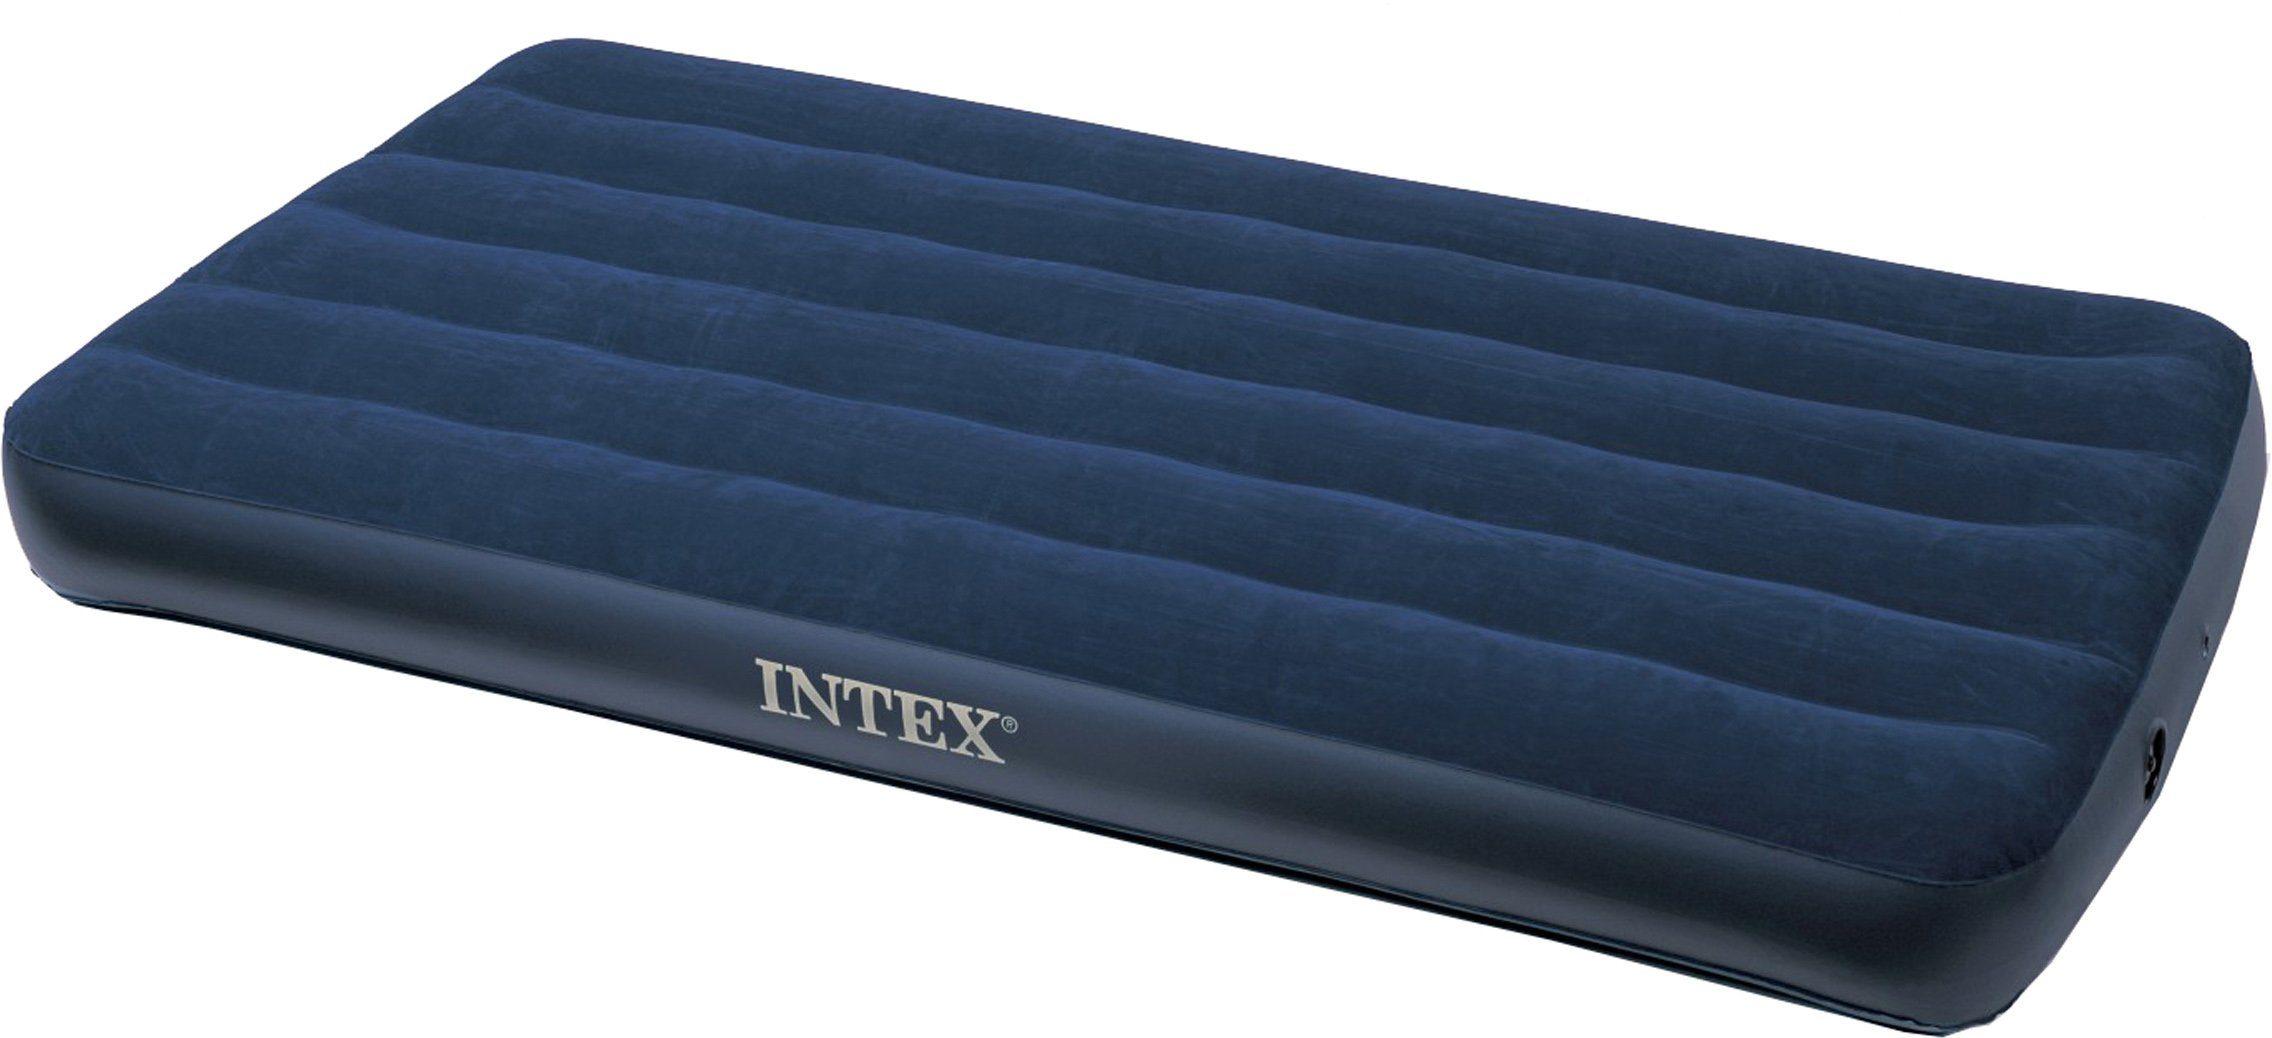 Intex Luftbett, »Classic Downy Twin«